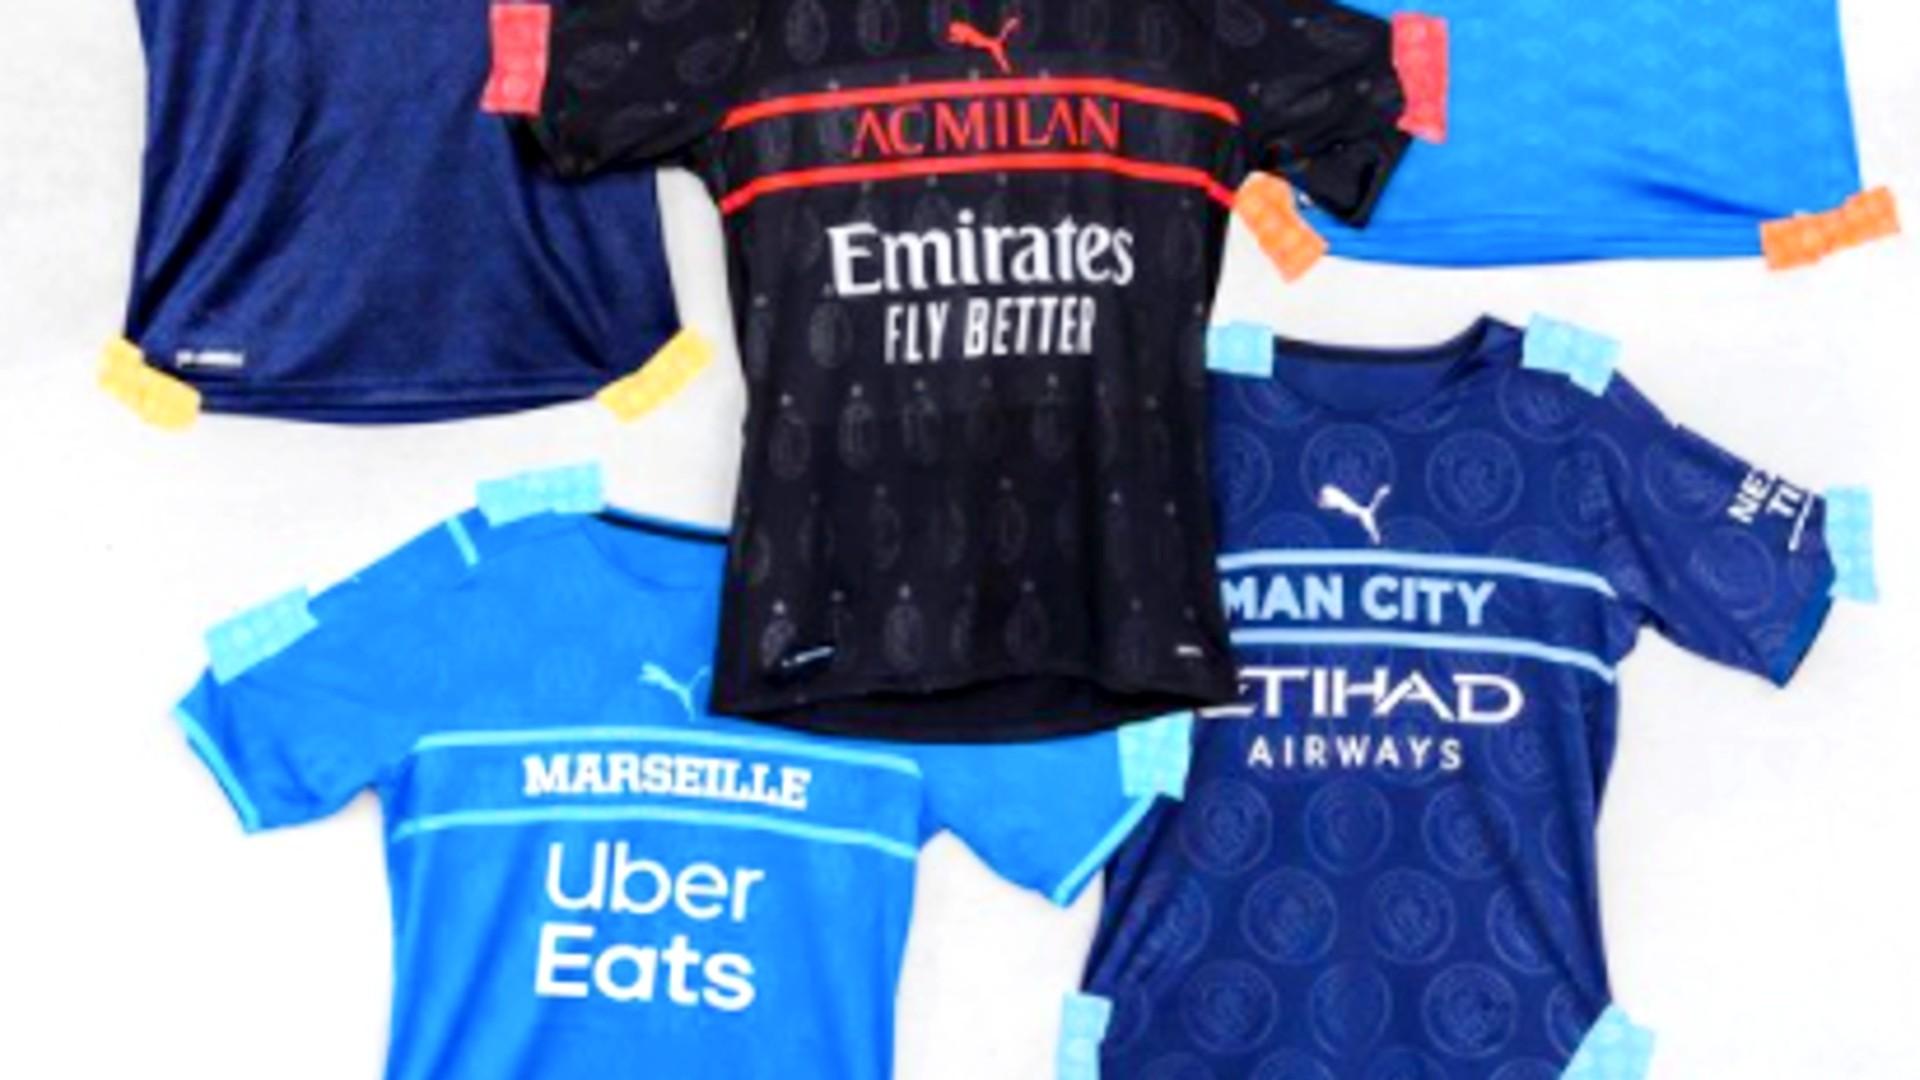 puma jerseys third kits soccer 2021 20hgh1lo41q61073336ds0wrv